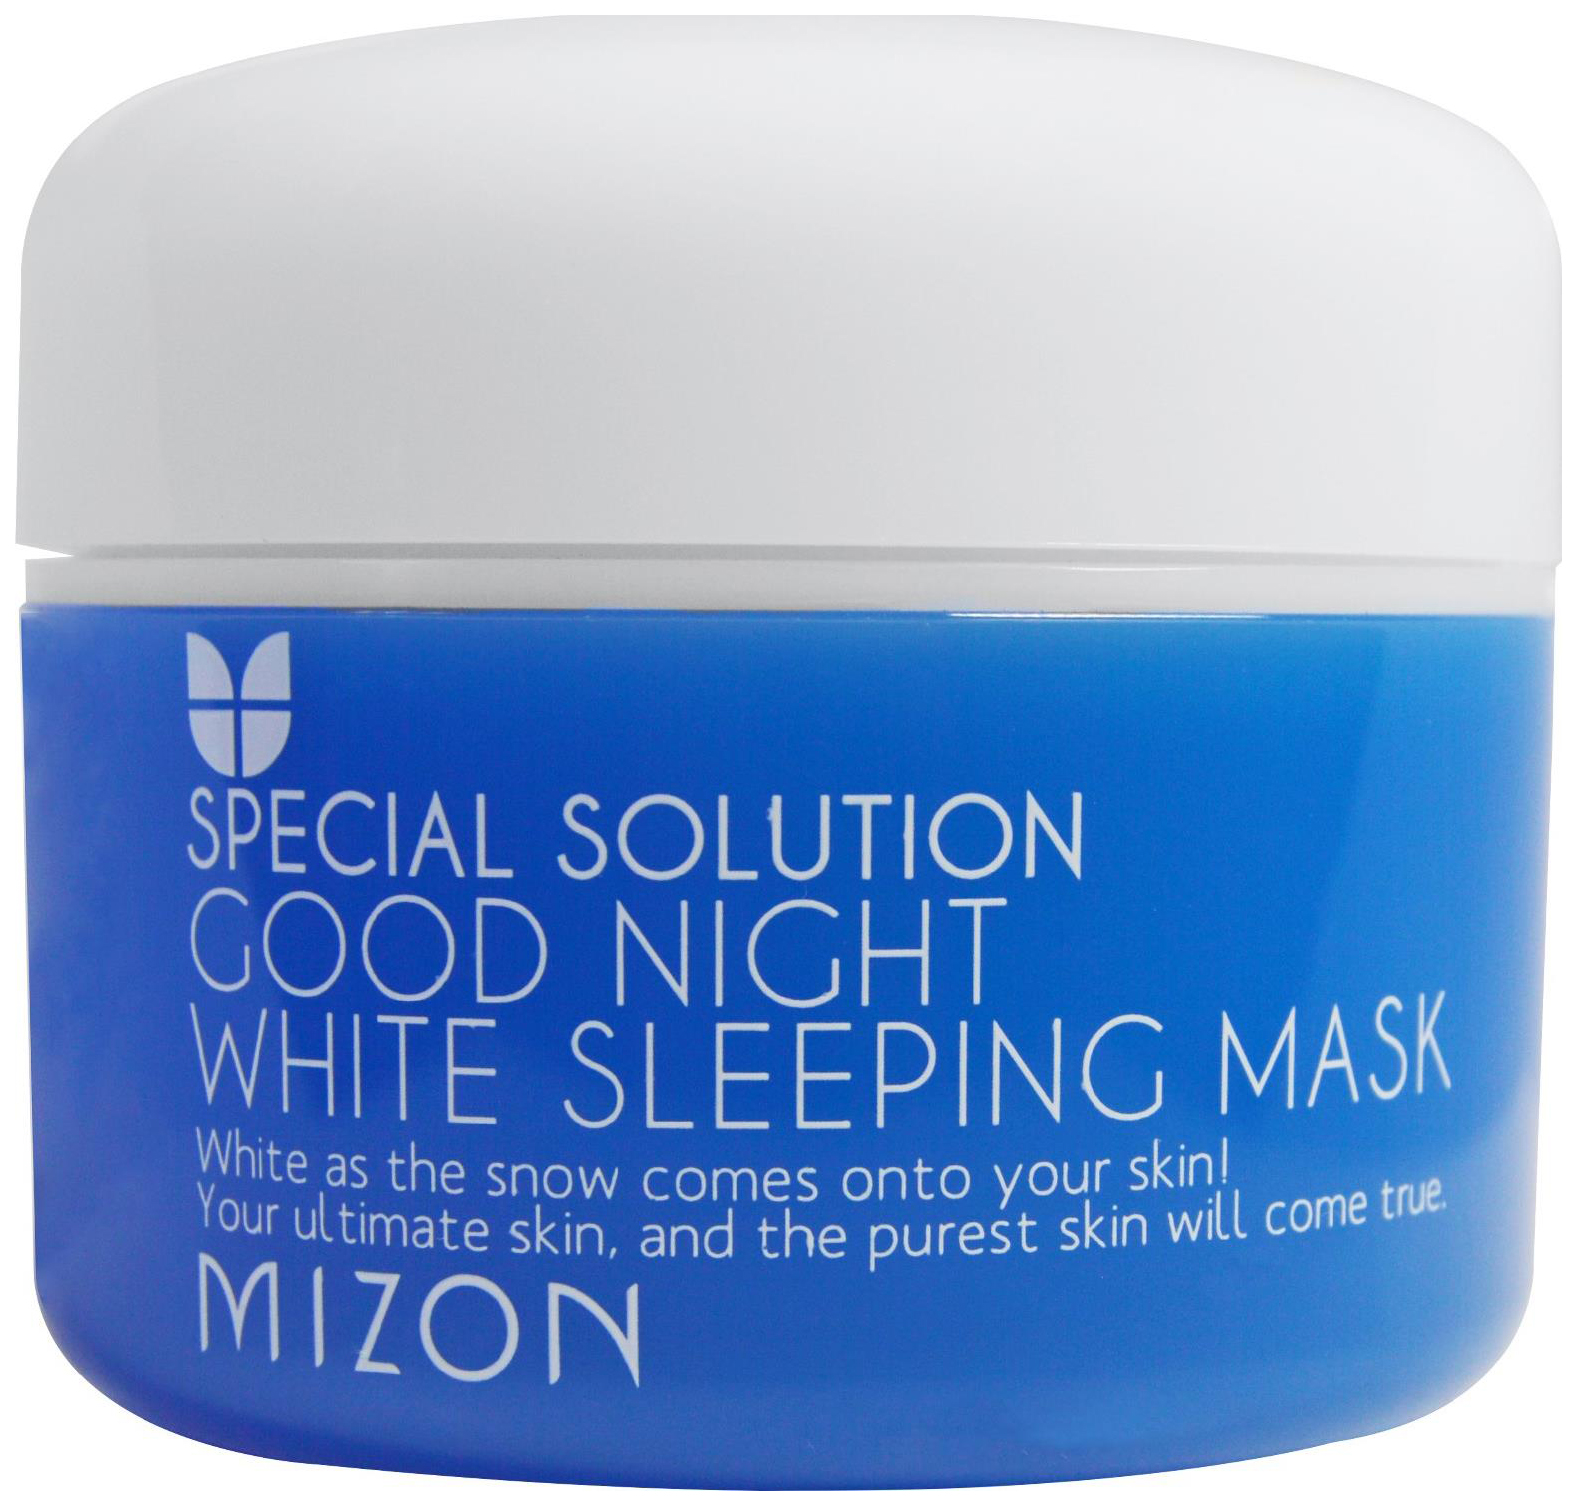 Купить Маска для лица MIZON Good Night White Sleeping Mask 80 мл